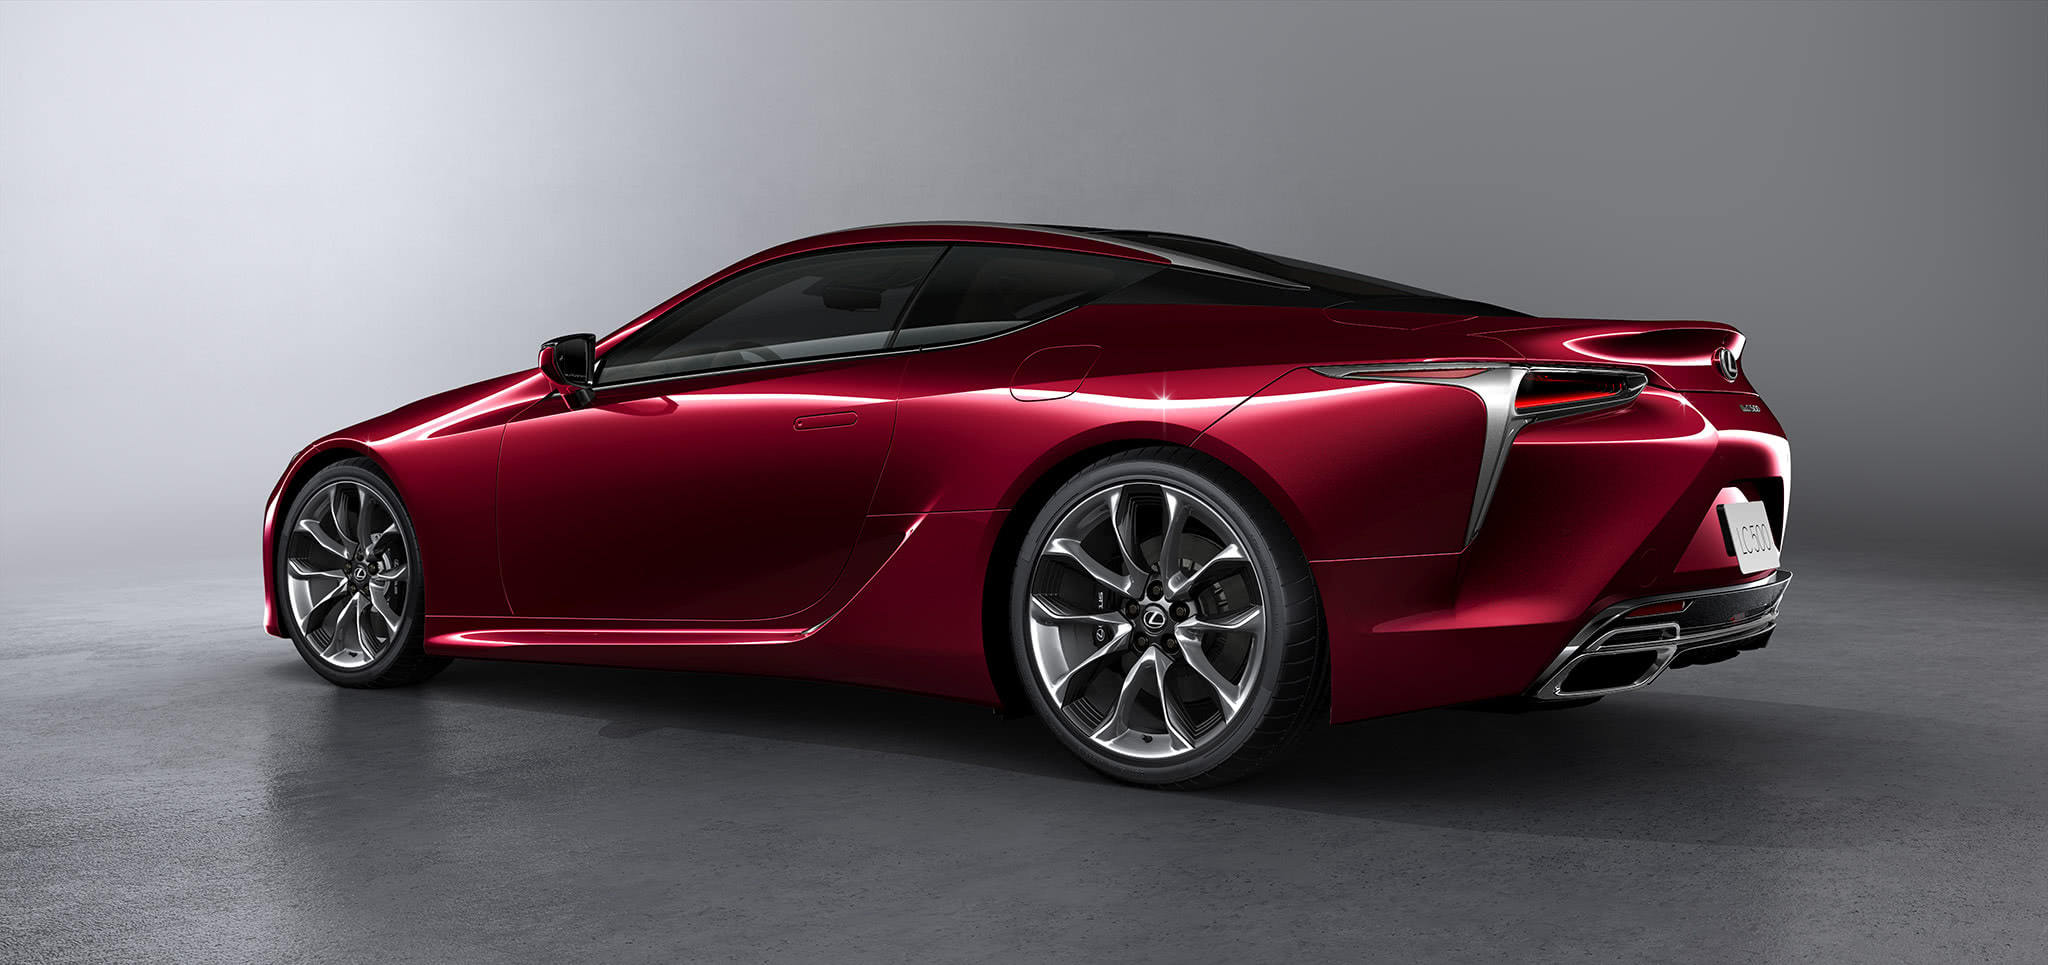 LC500 σε κόκκινο χρώμα